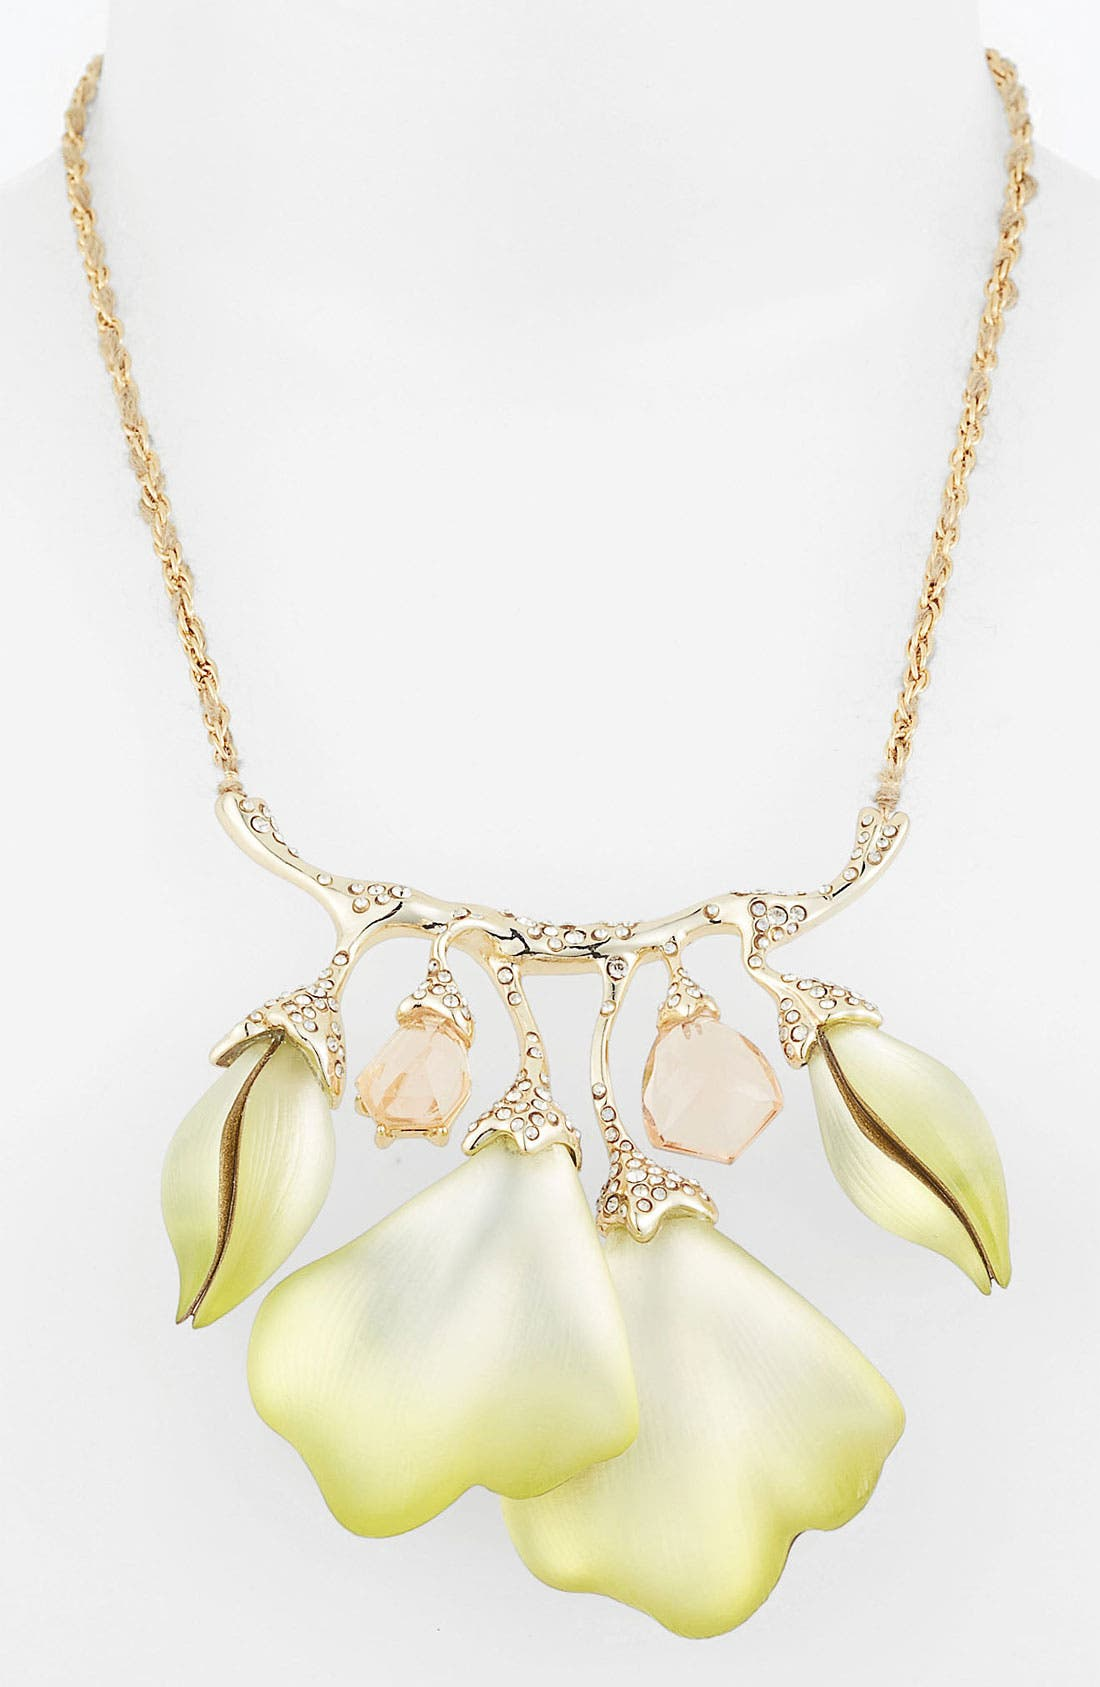 Main Image - Alexis Bittar 'Ophelia' Bib Necklace